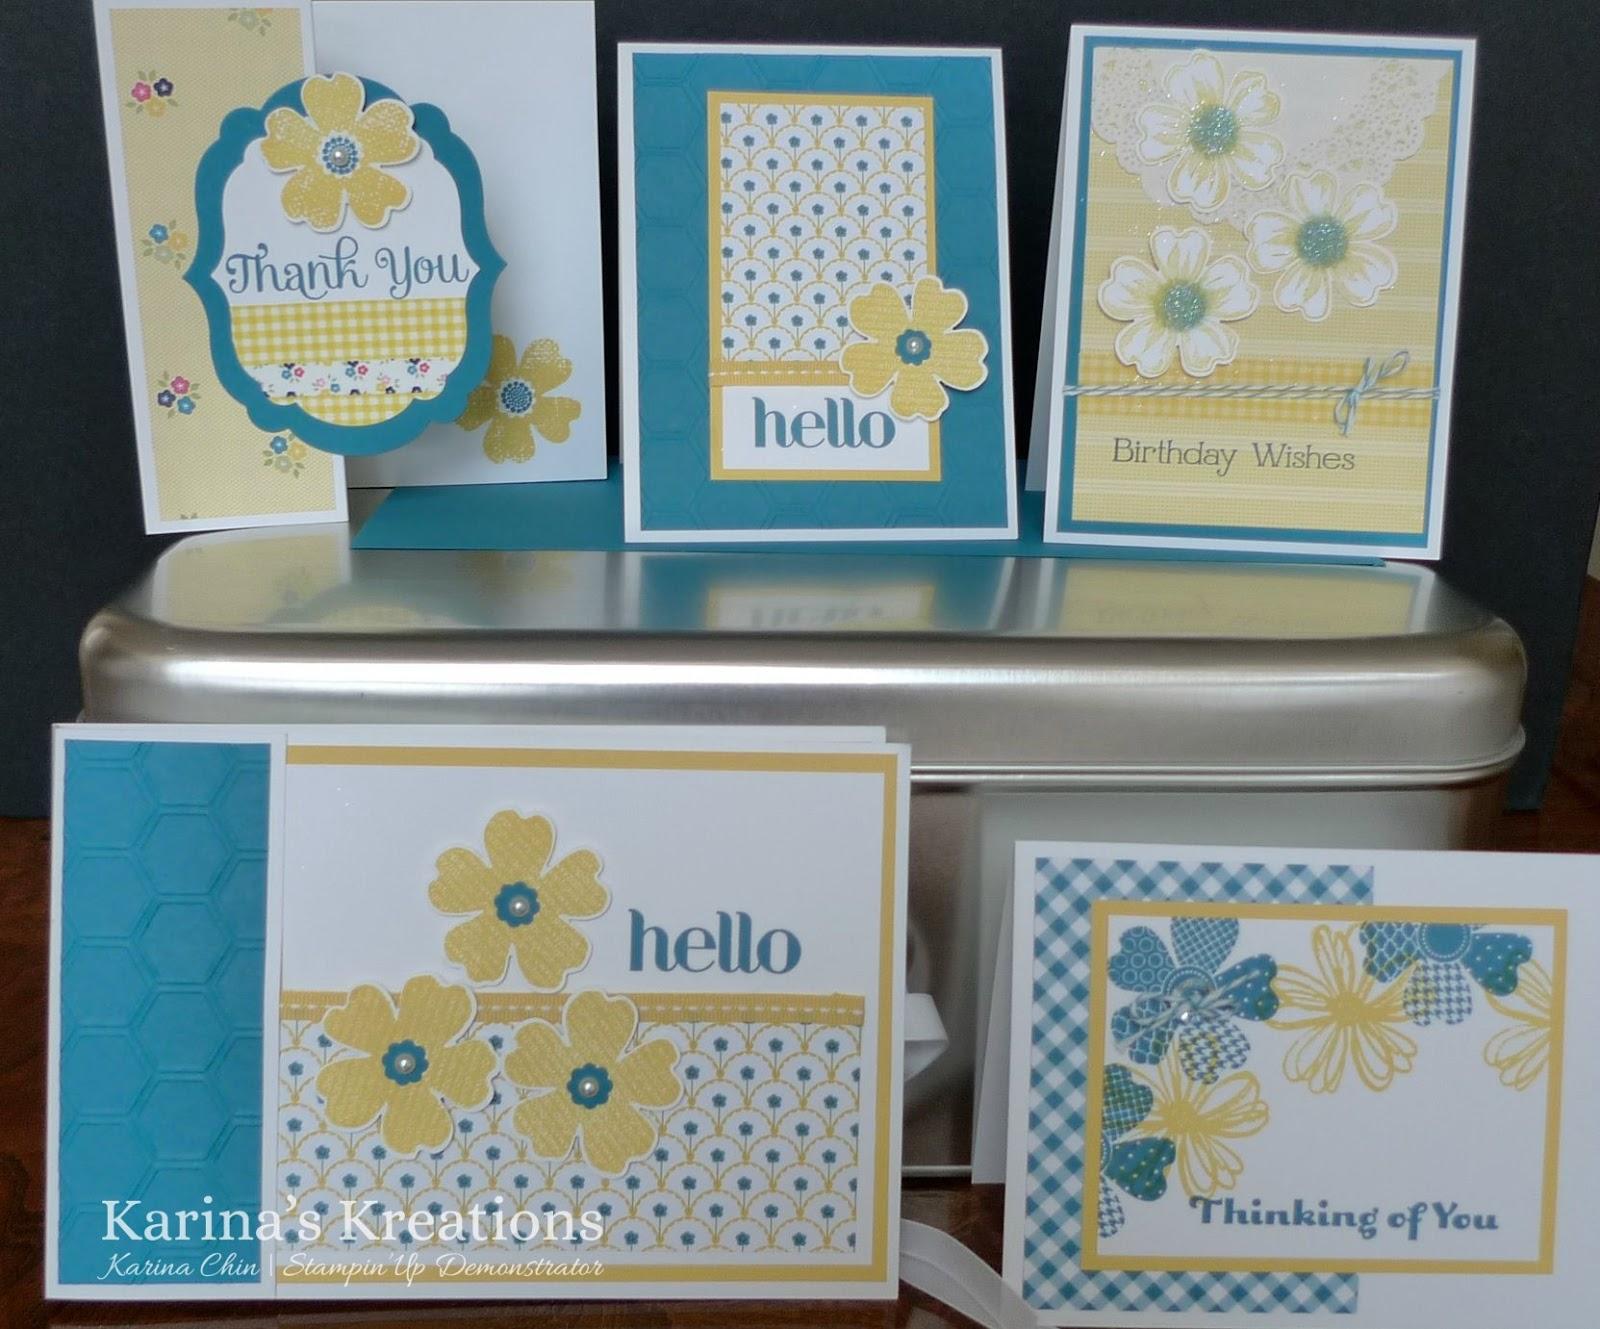 karina's kreations stampin'up flower shop bundle card class